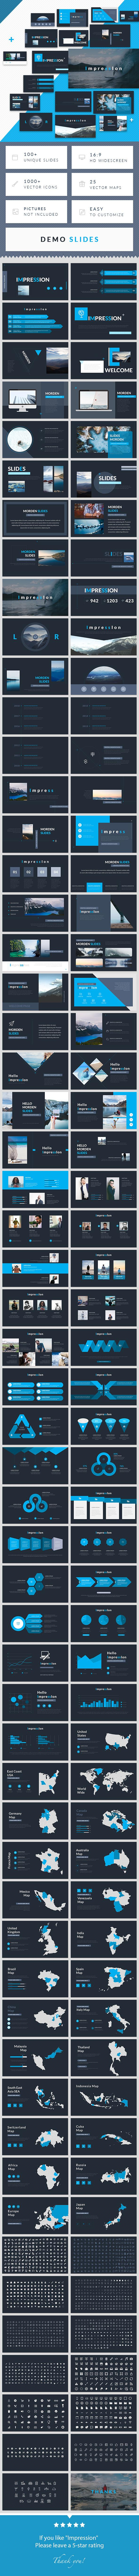 Impression - PowerPoint Presentation Template